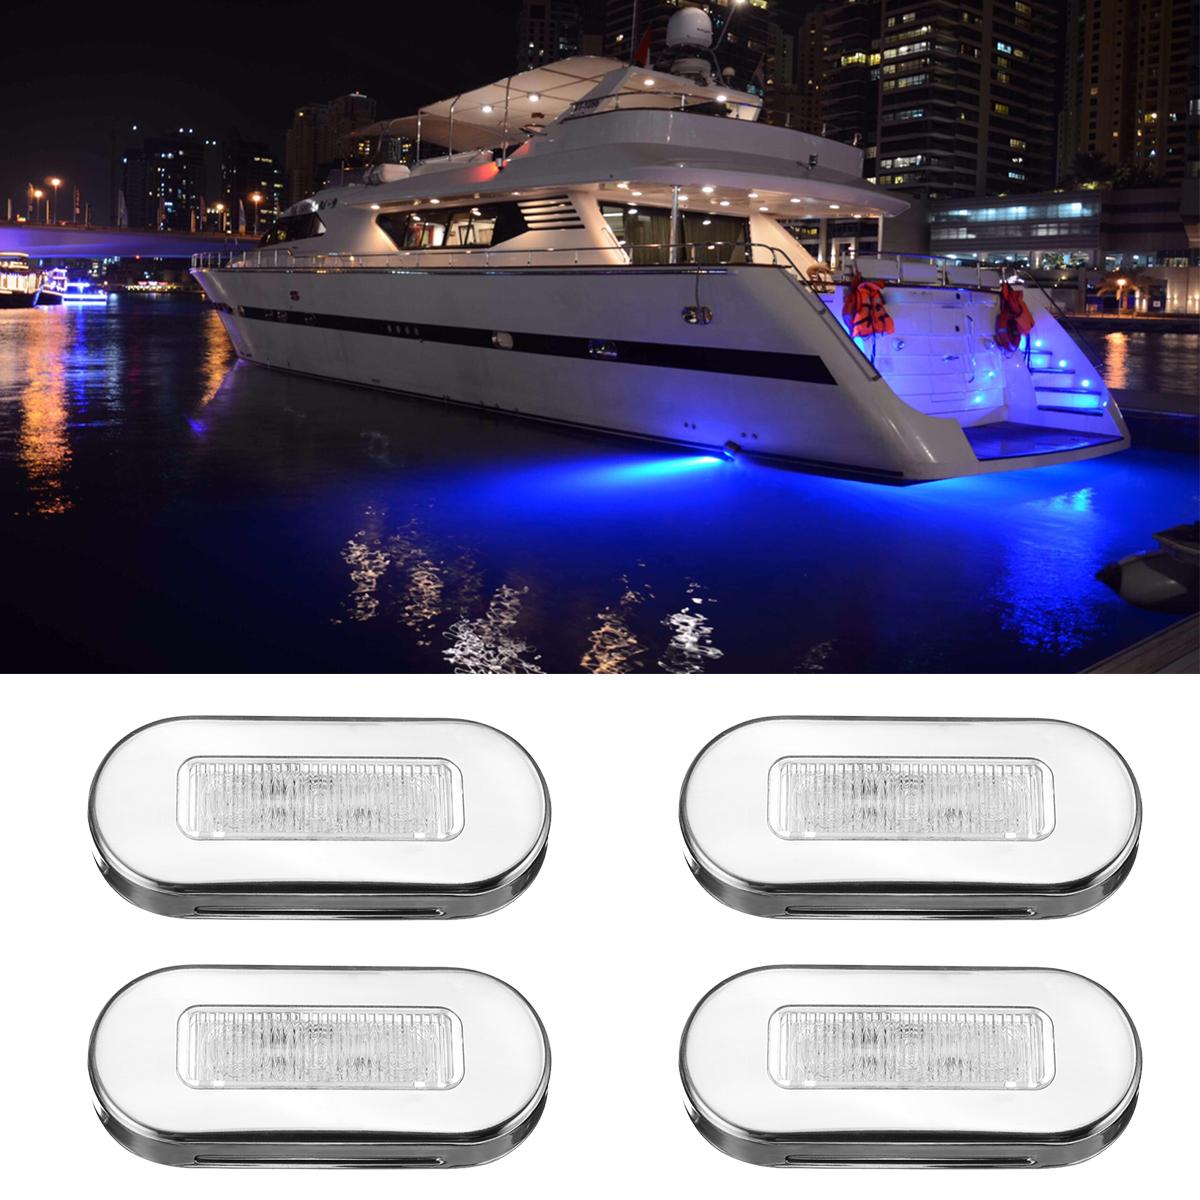 4X Red LED 12V Marine Boat Courtesy Light RV Yacht Deck Outdoor Step Light